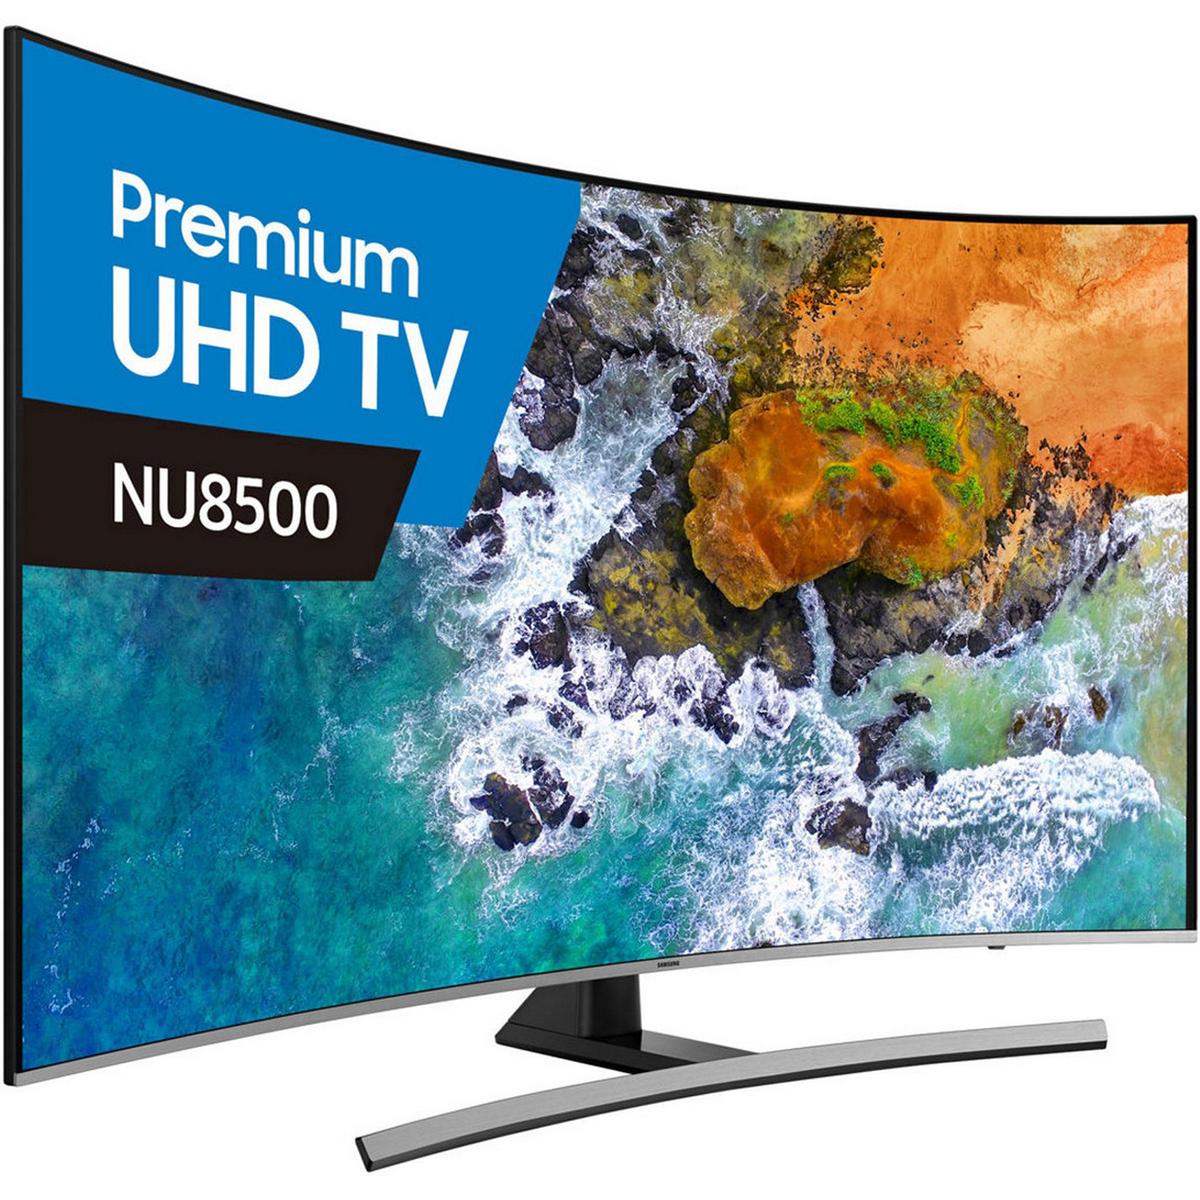 Buy Samsung 4K Smart Premium Ultra HD Curved LED TV